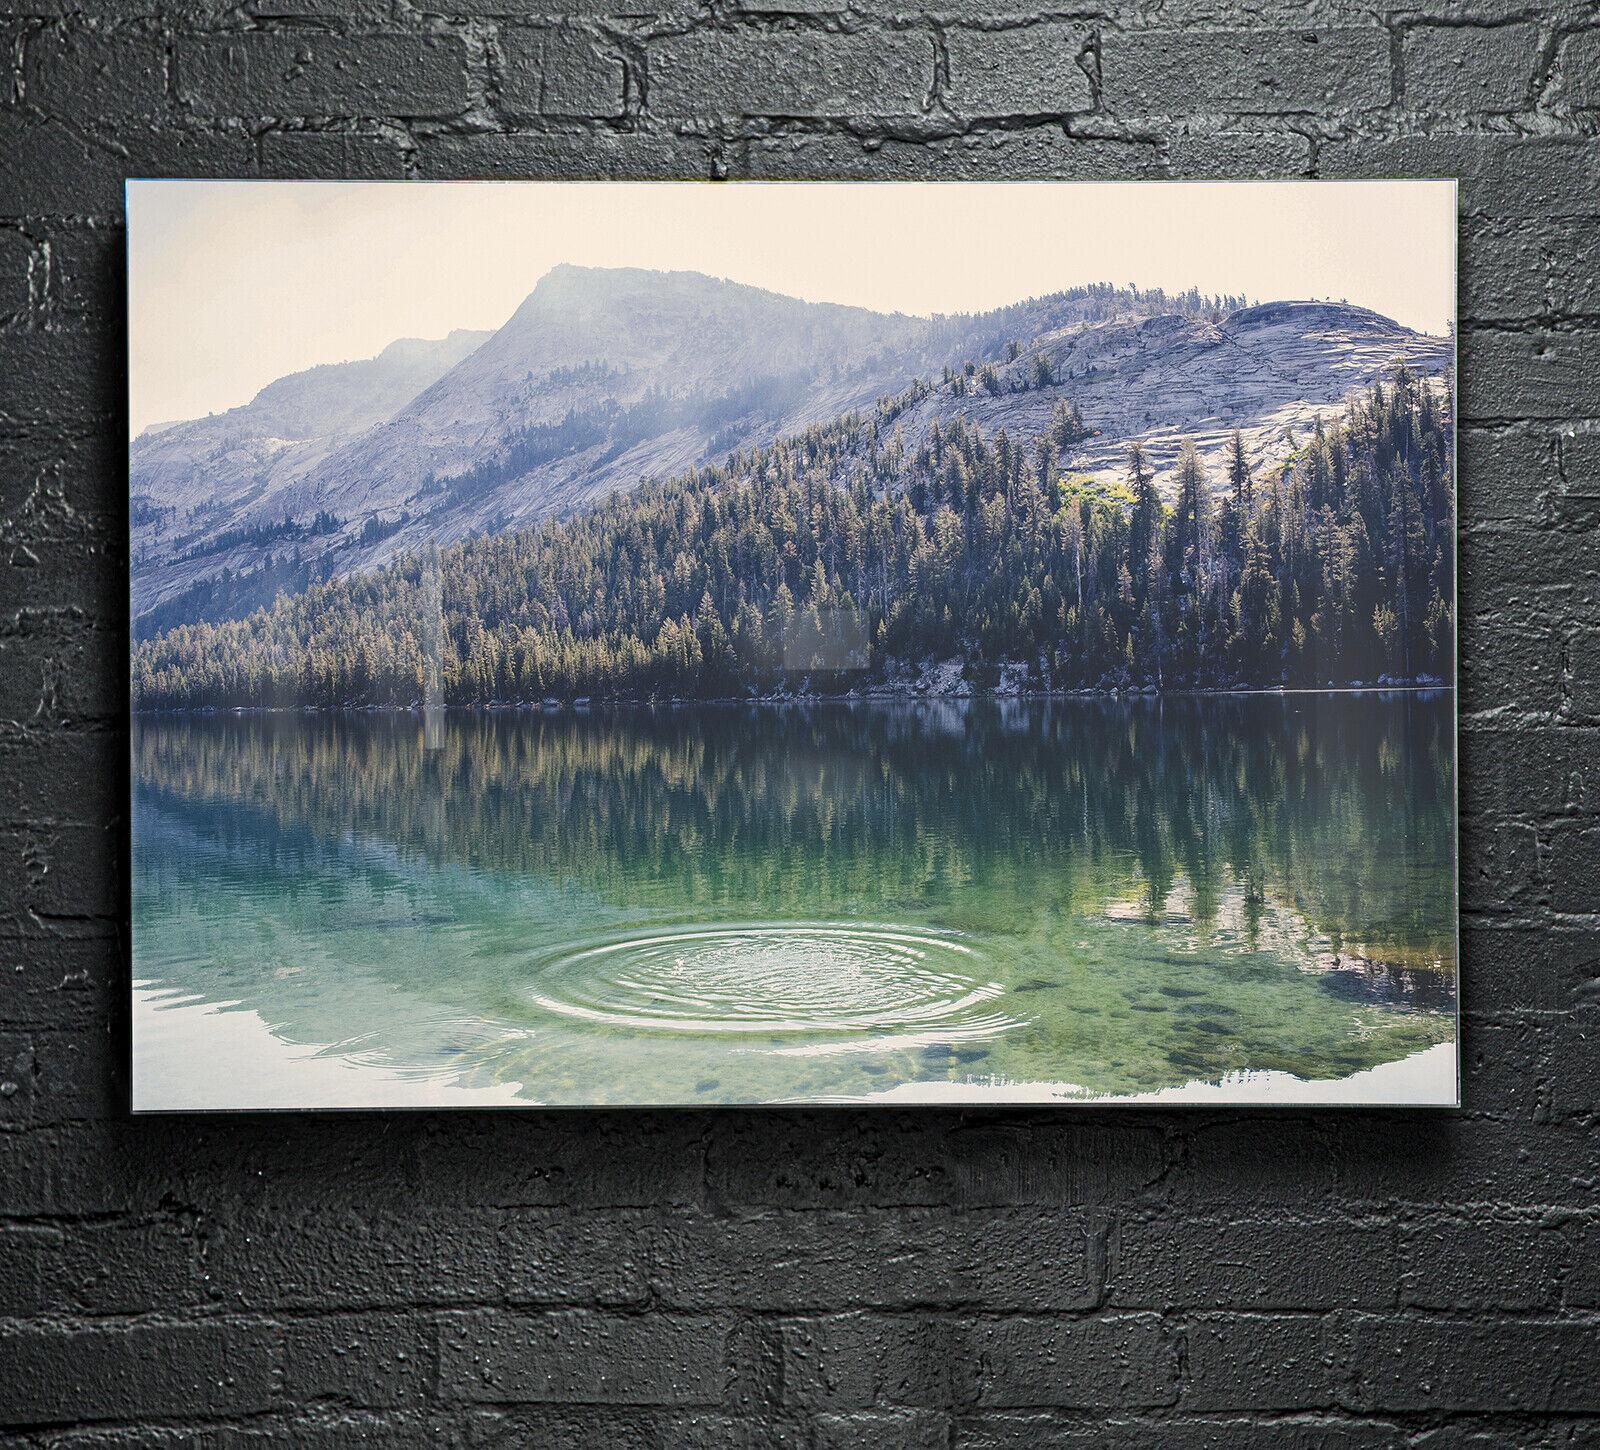 Poster Glas Wand Kunst Drucken Bild ANY Größe Sky Water Drop Mountain p186689